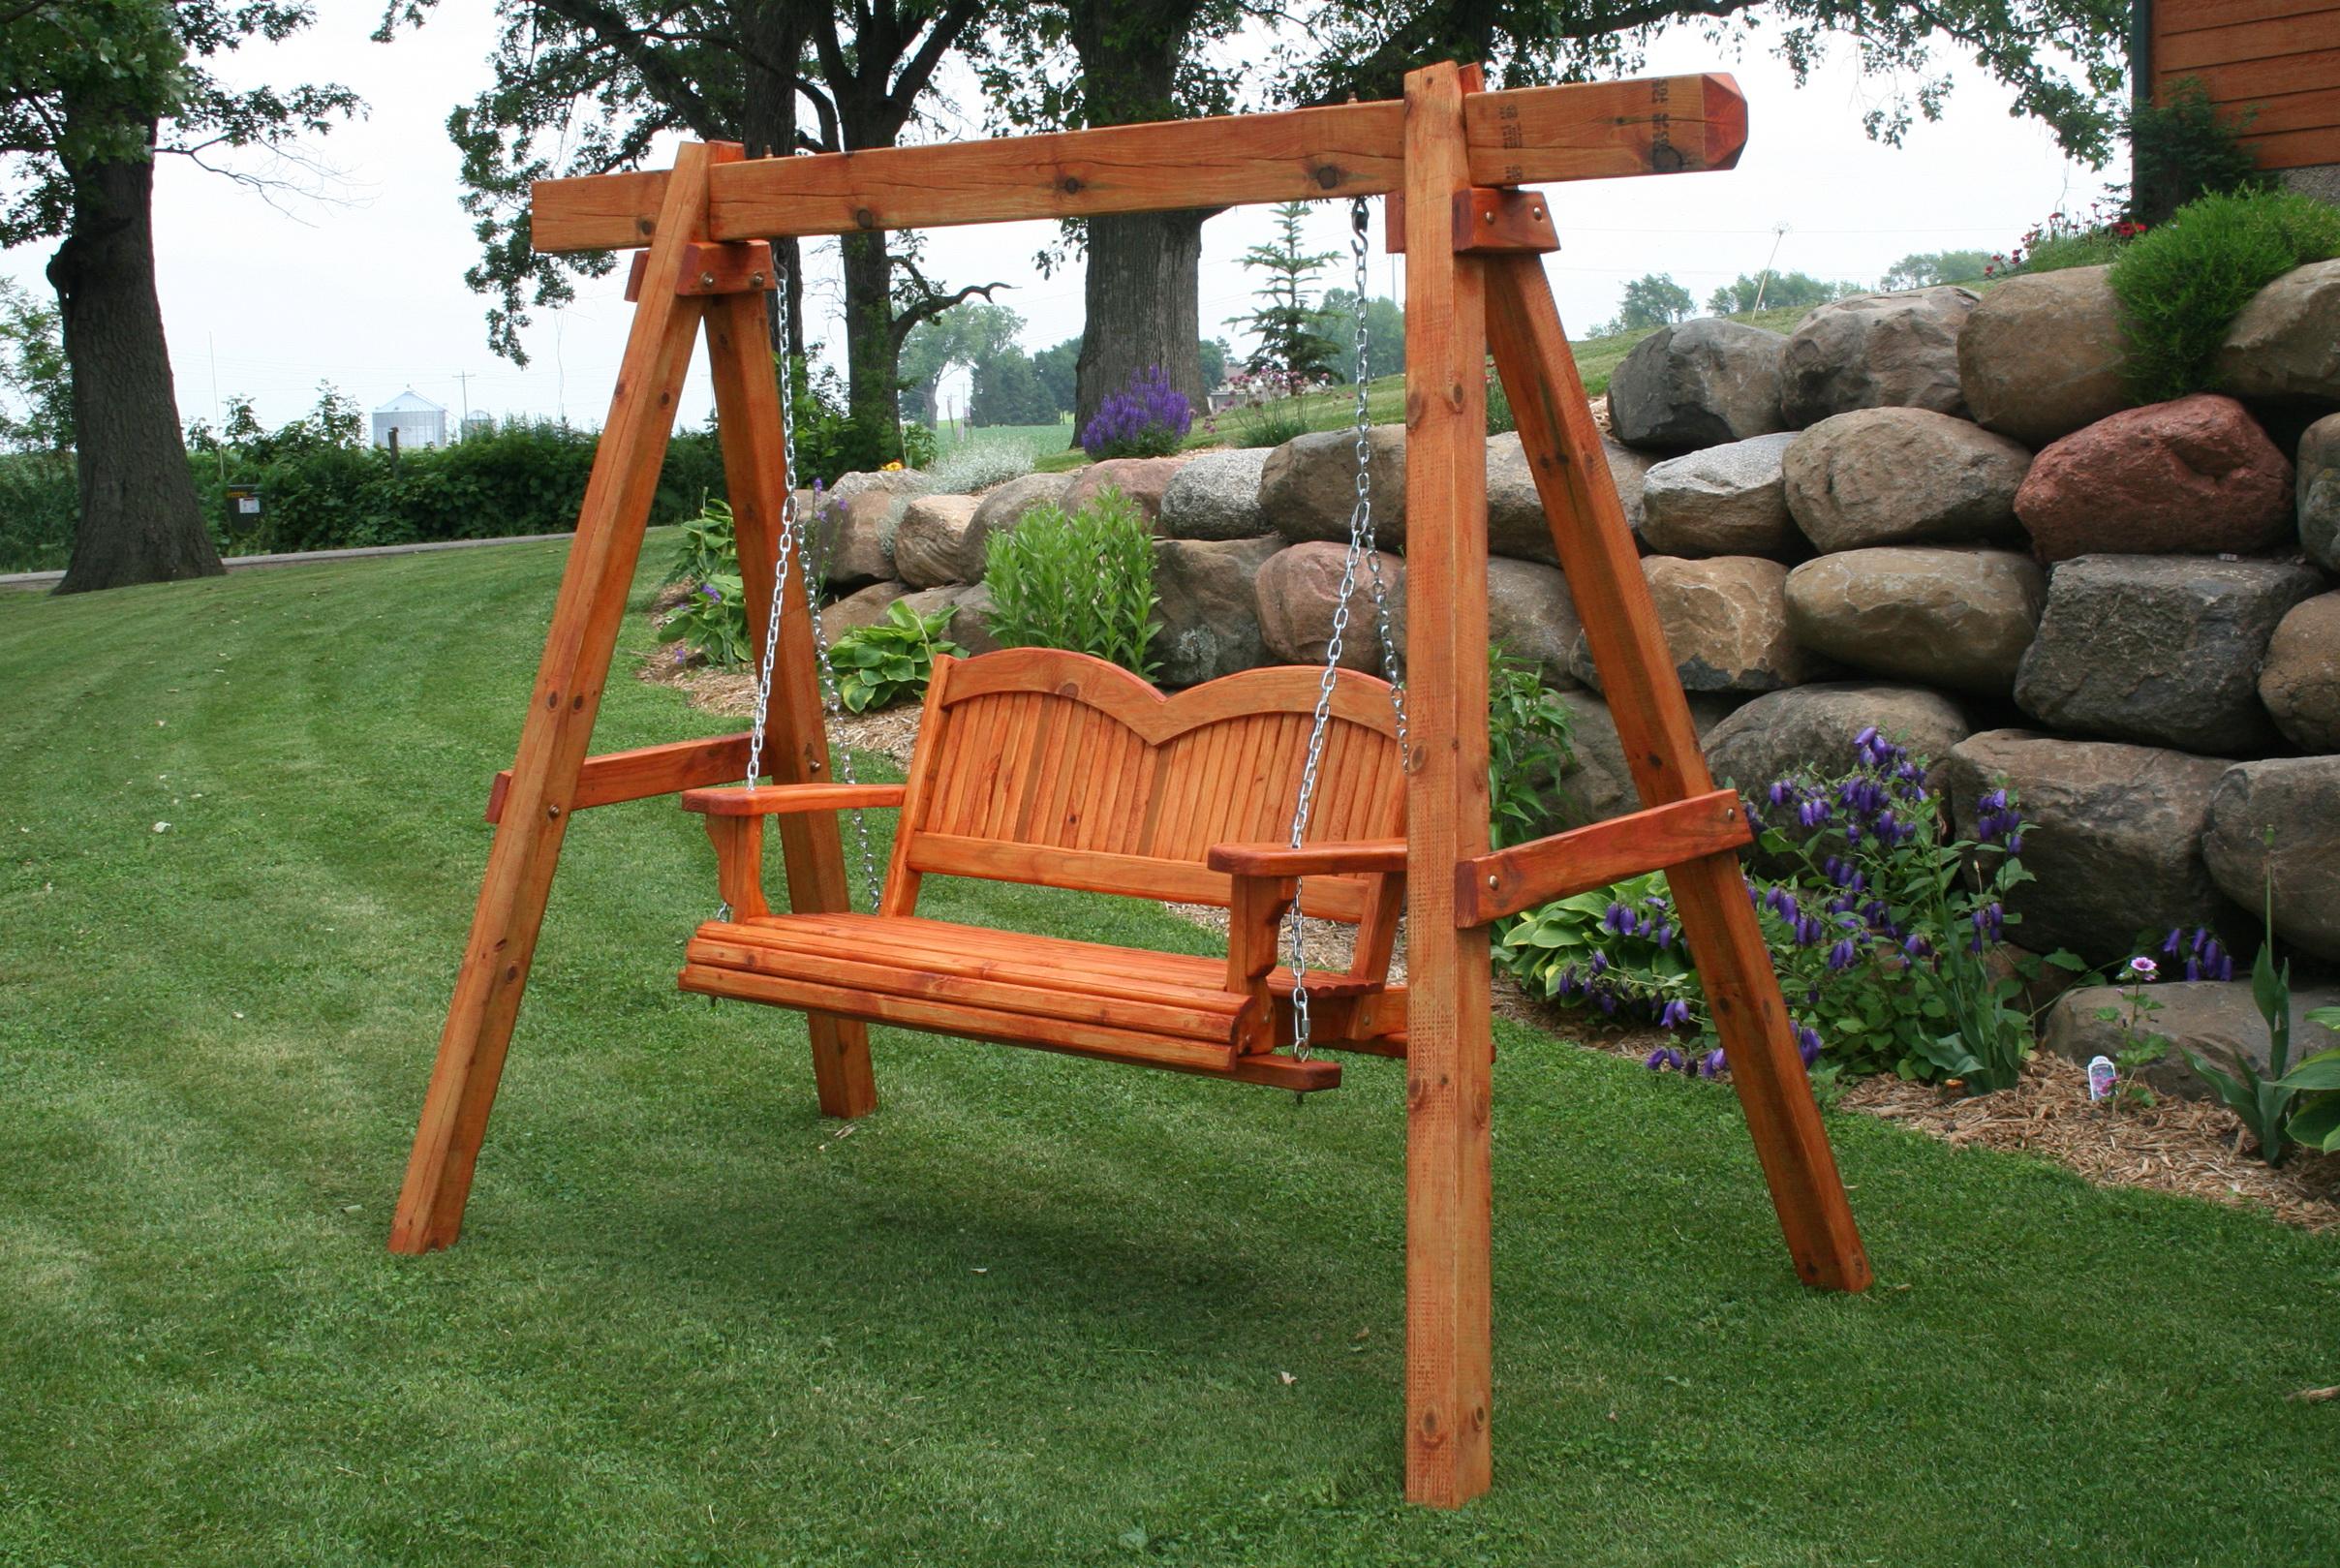 A Frame Porch Swing Plans | Home Design Ideas